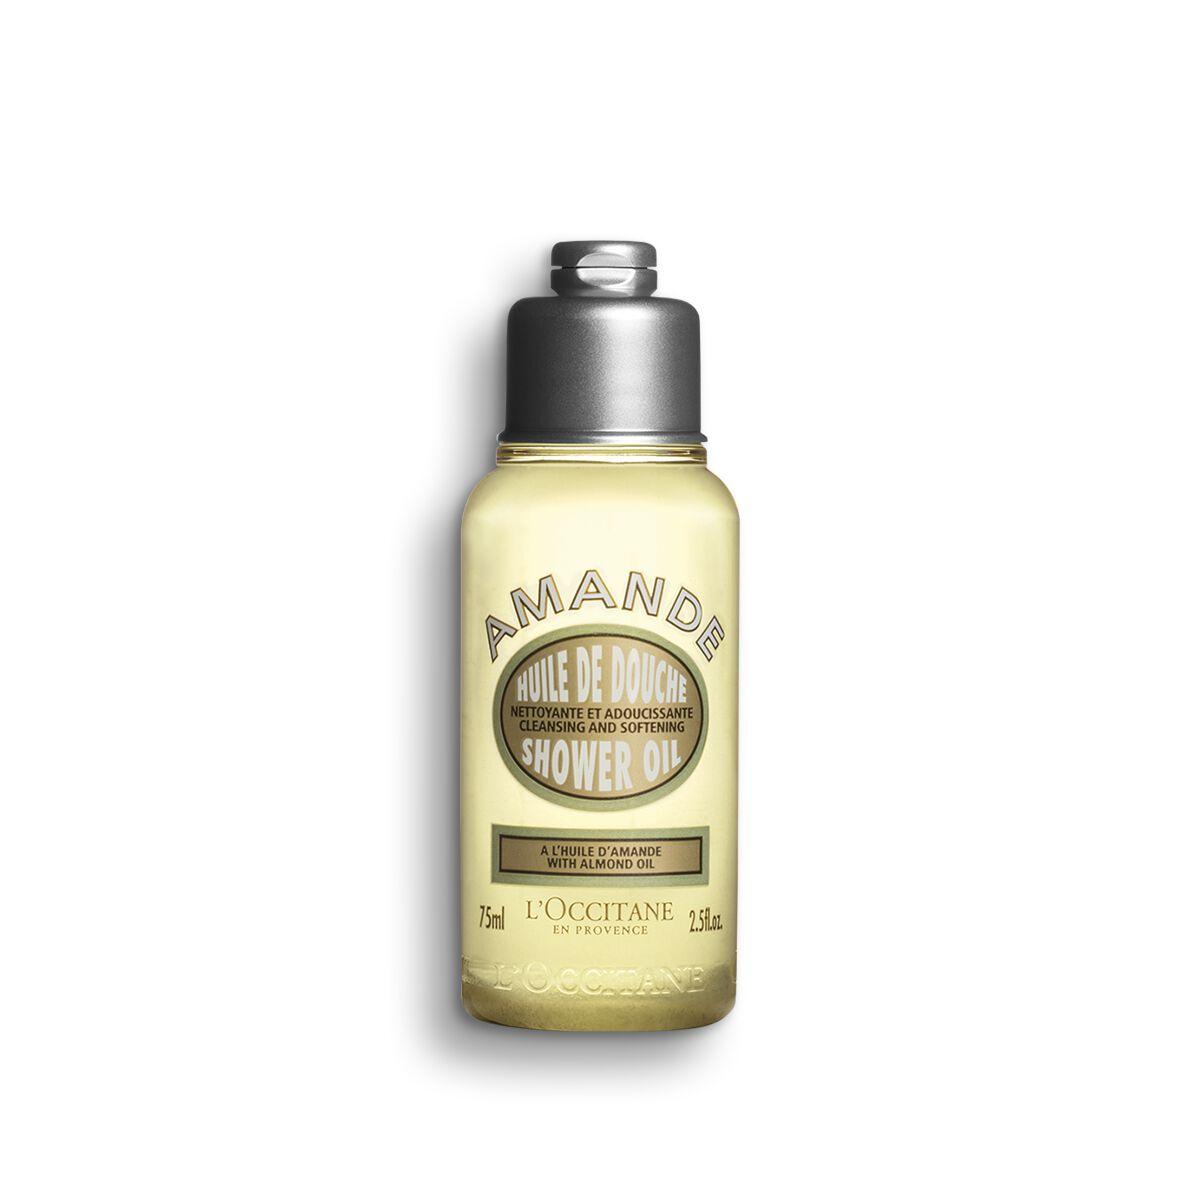 Almond Shower Oil 2.5 fl. oz.